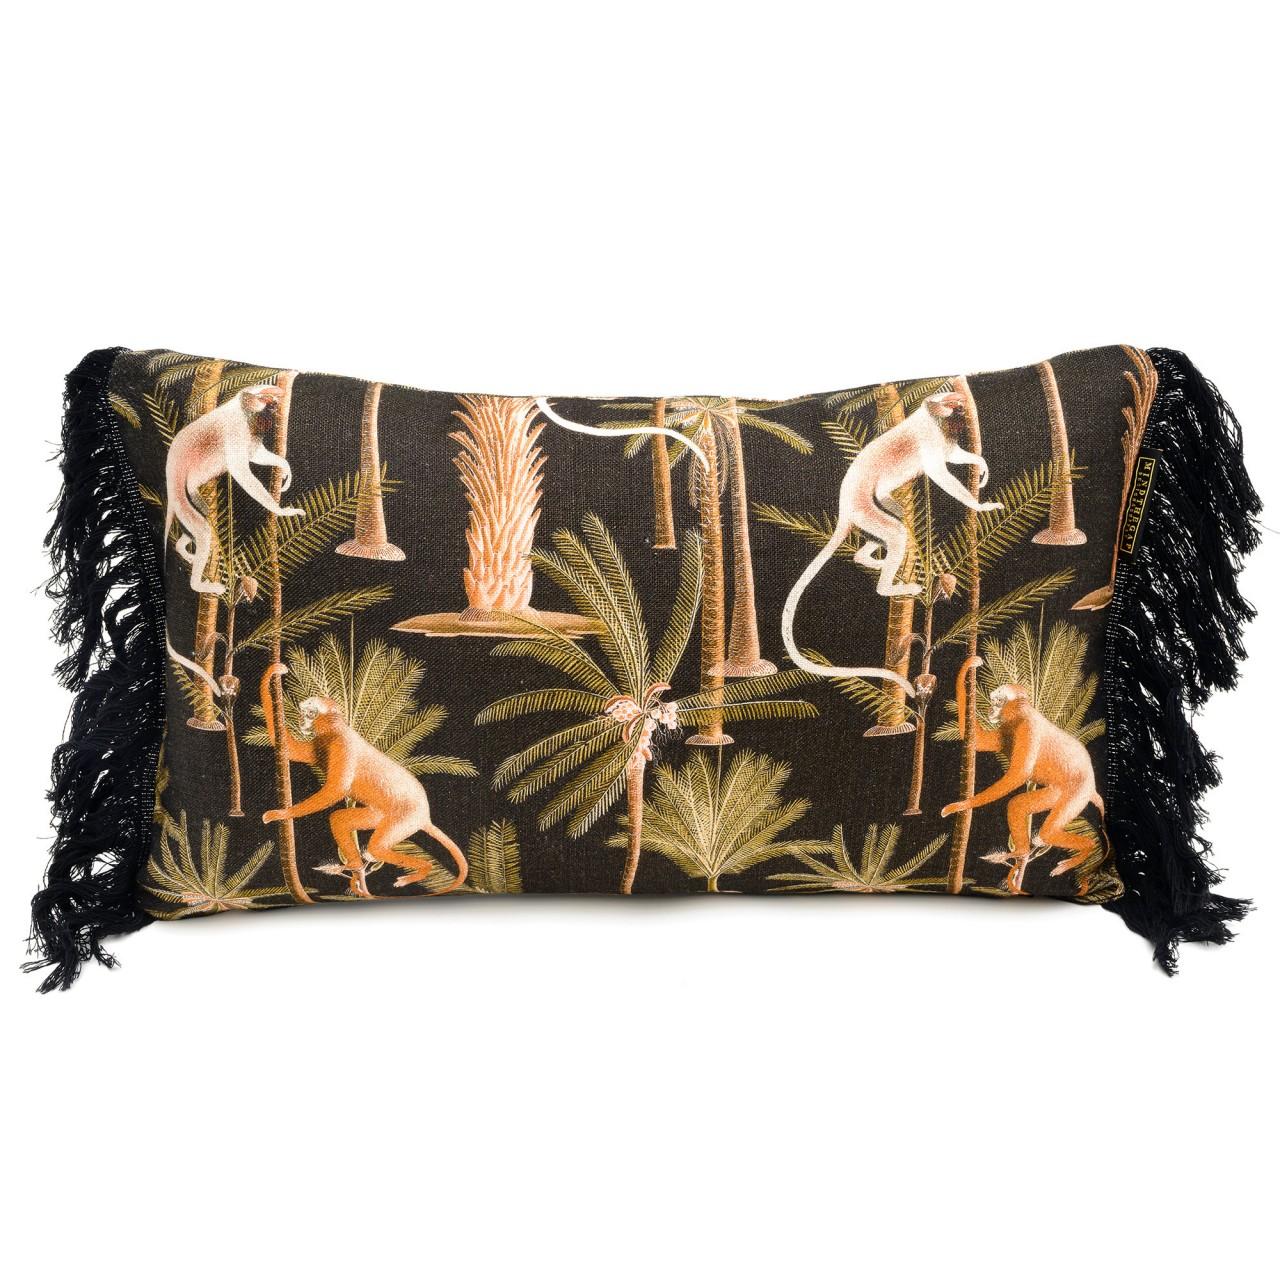 BARBADOS Anthracite Linen Cushion